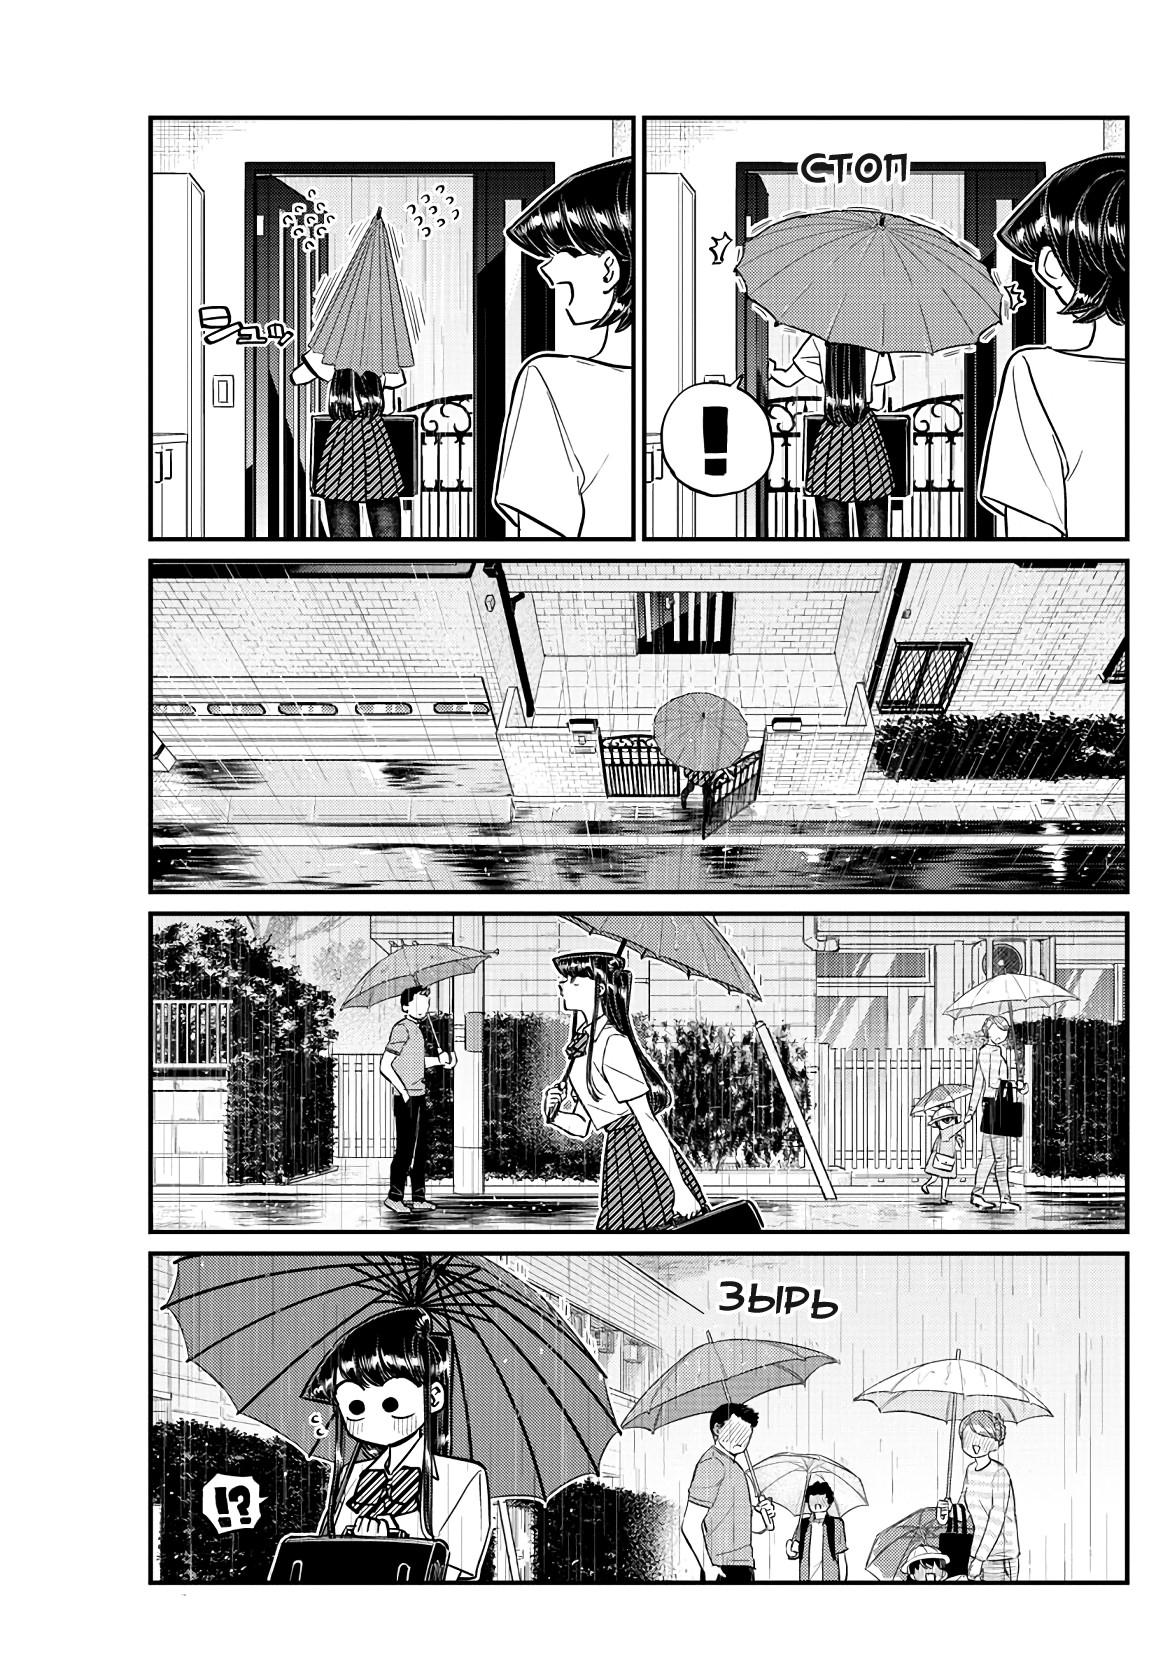 https://r2.ninemanga.com/comics/pic4/12/27788/1350395/1559237533220.jpg Page 3